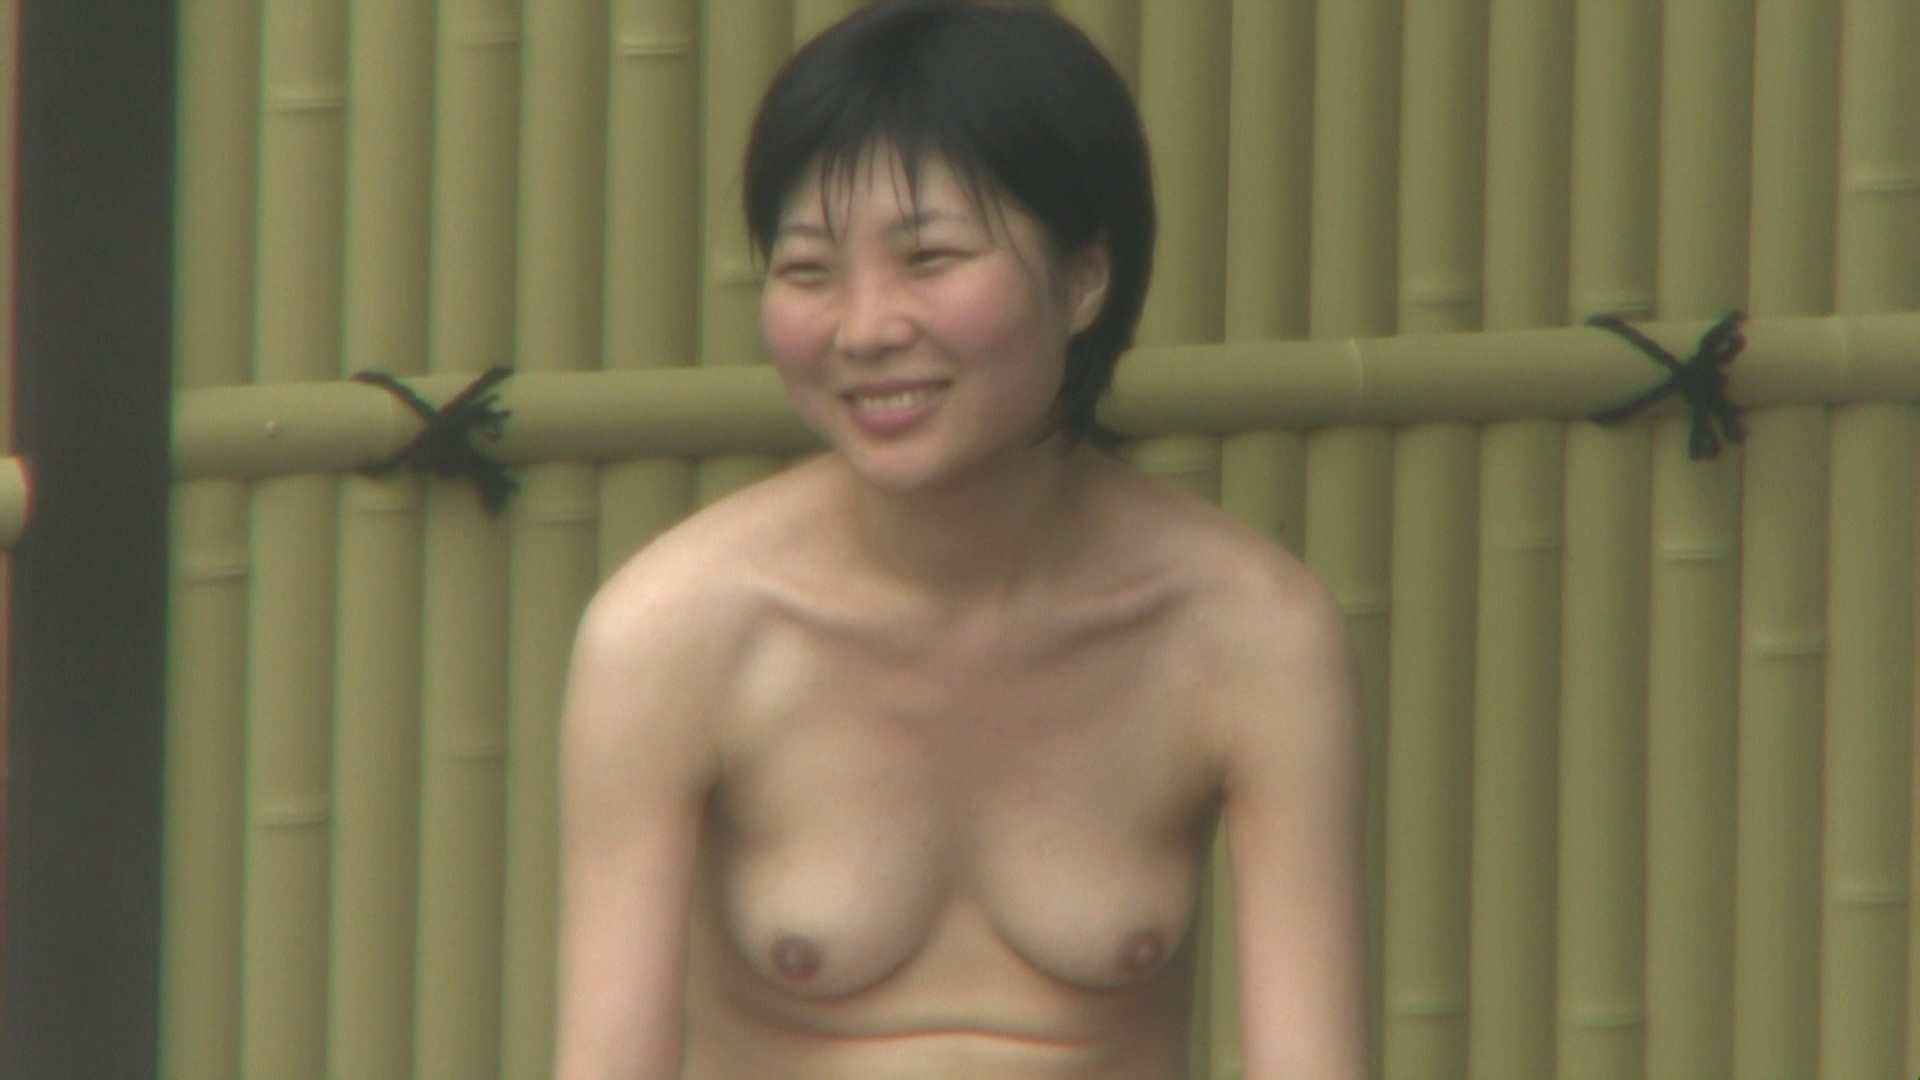 Aquaな露天風呂Vol.74【VIP限定】 盗撮 隠し撮りオマンコ動画紹介 68画像 20